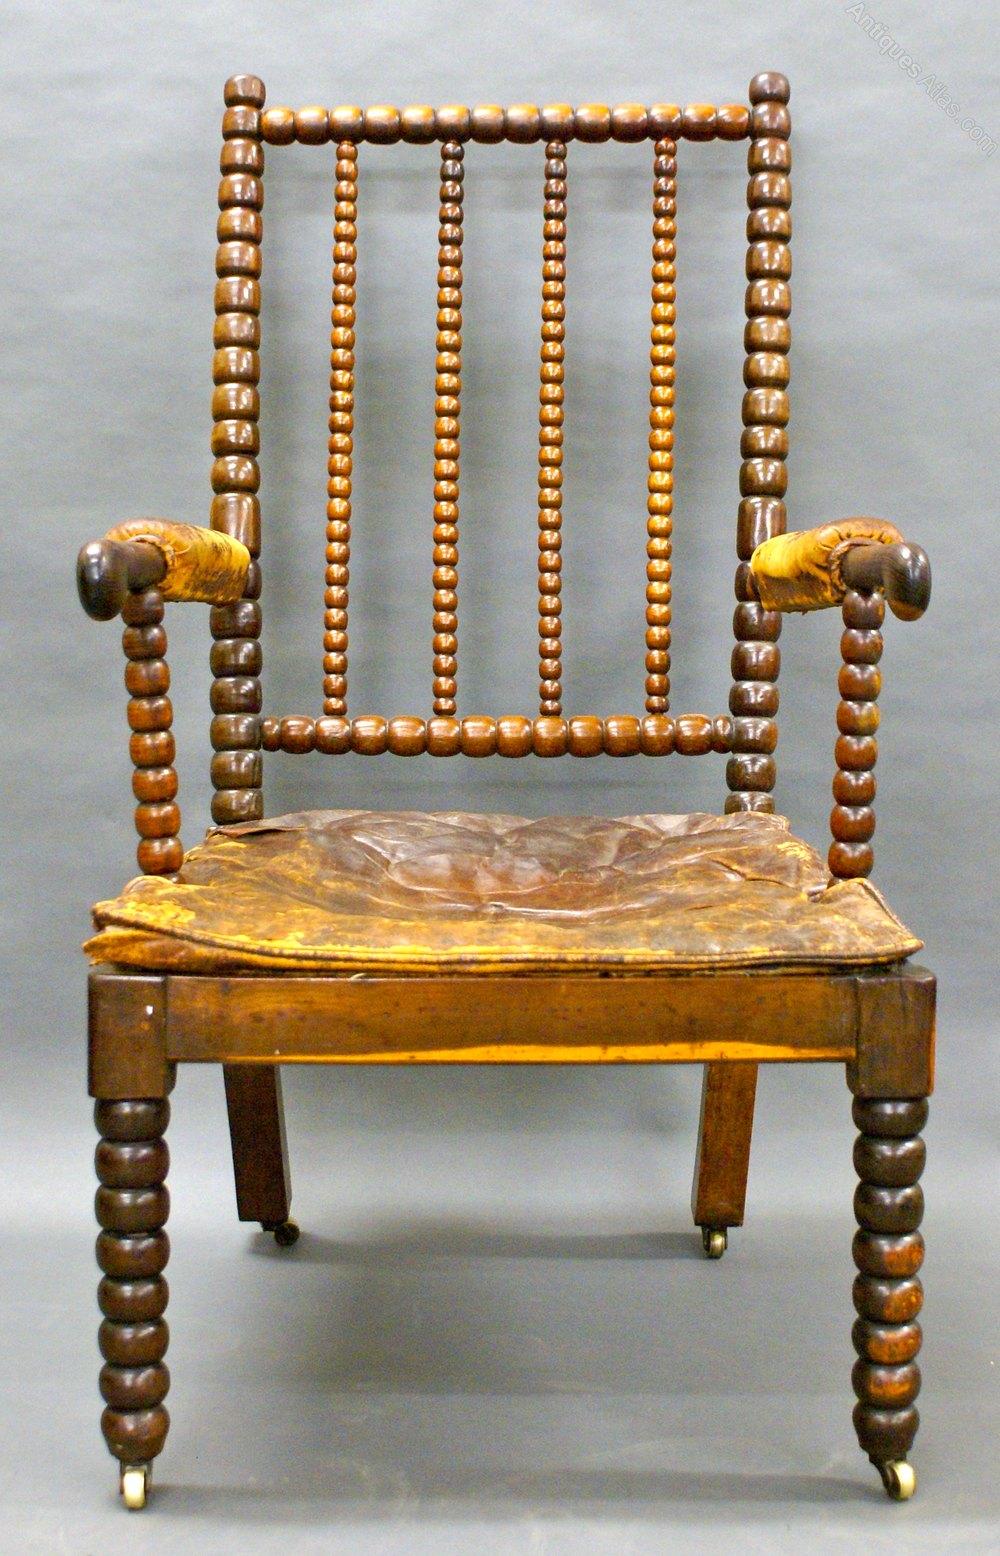 A Late 17th Century Bobbin Turned Laburnum Wood A